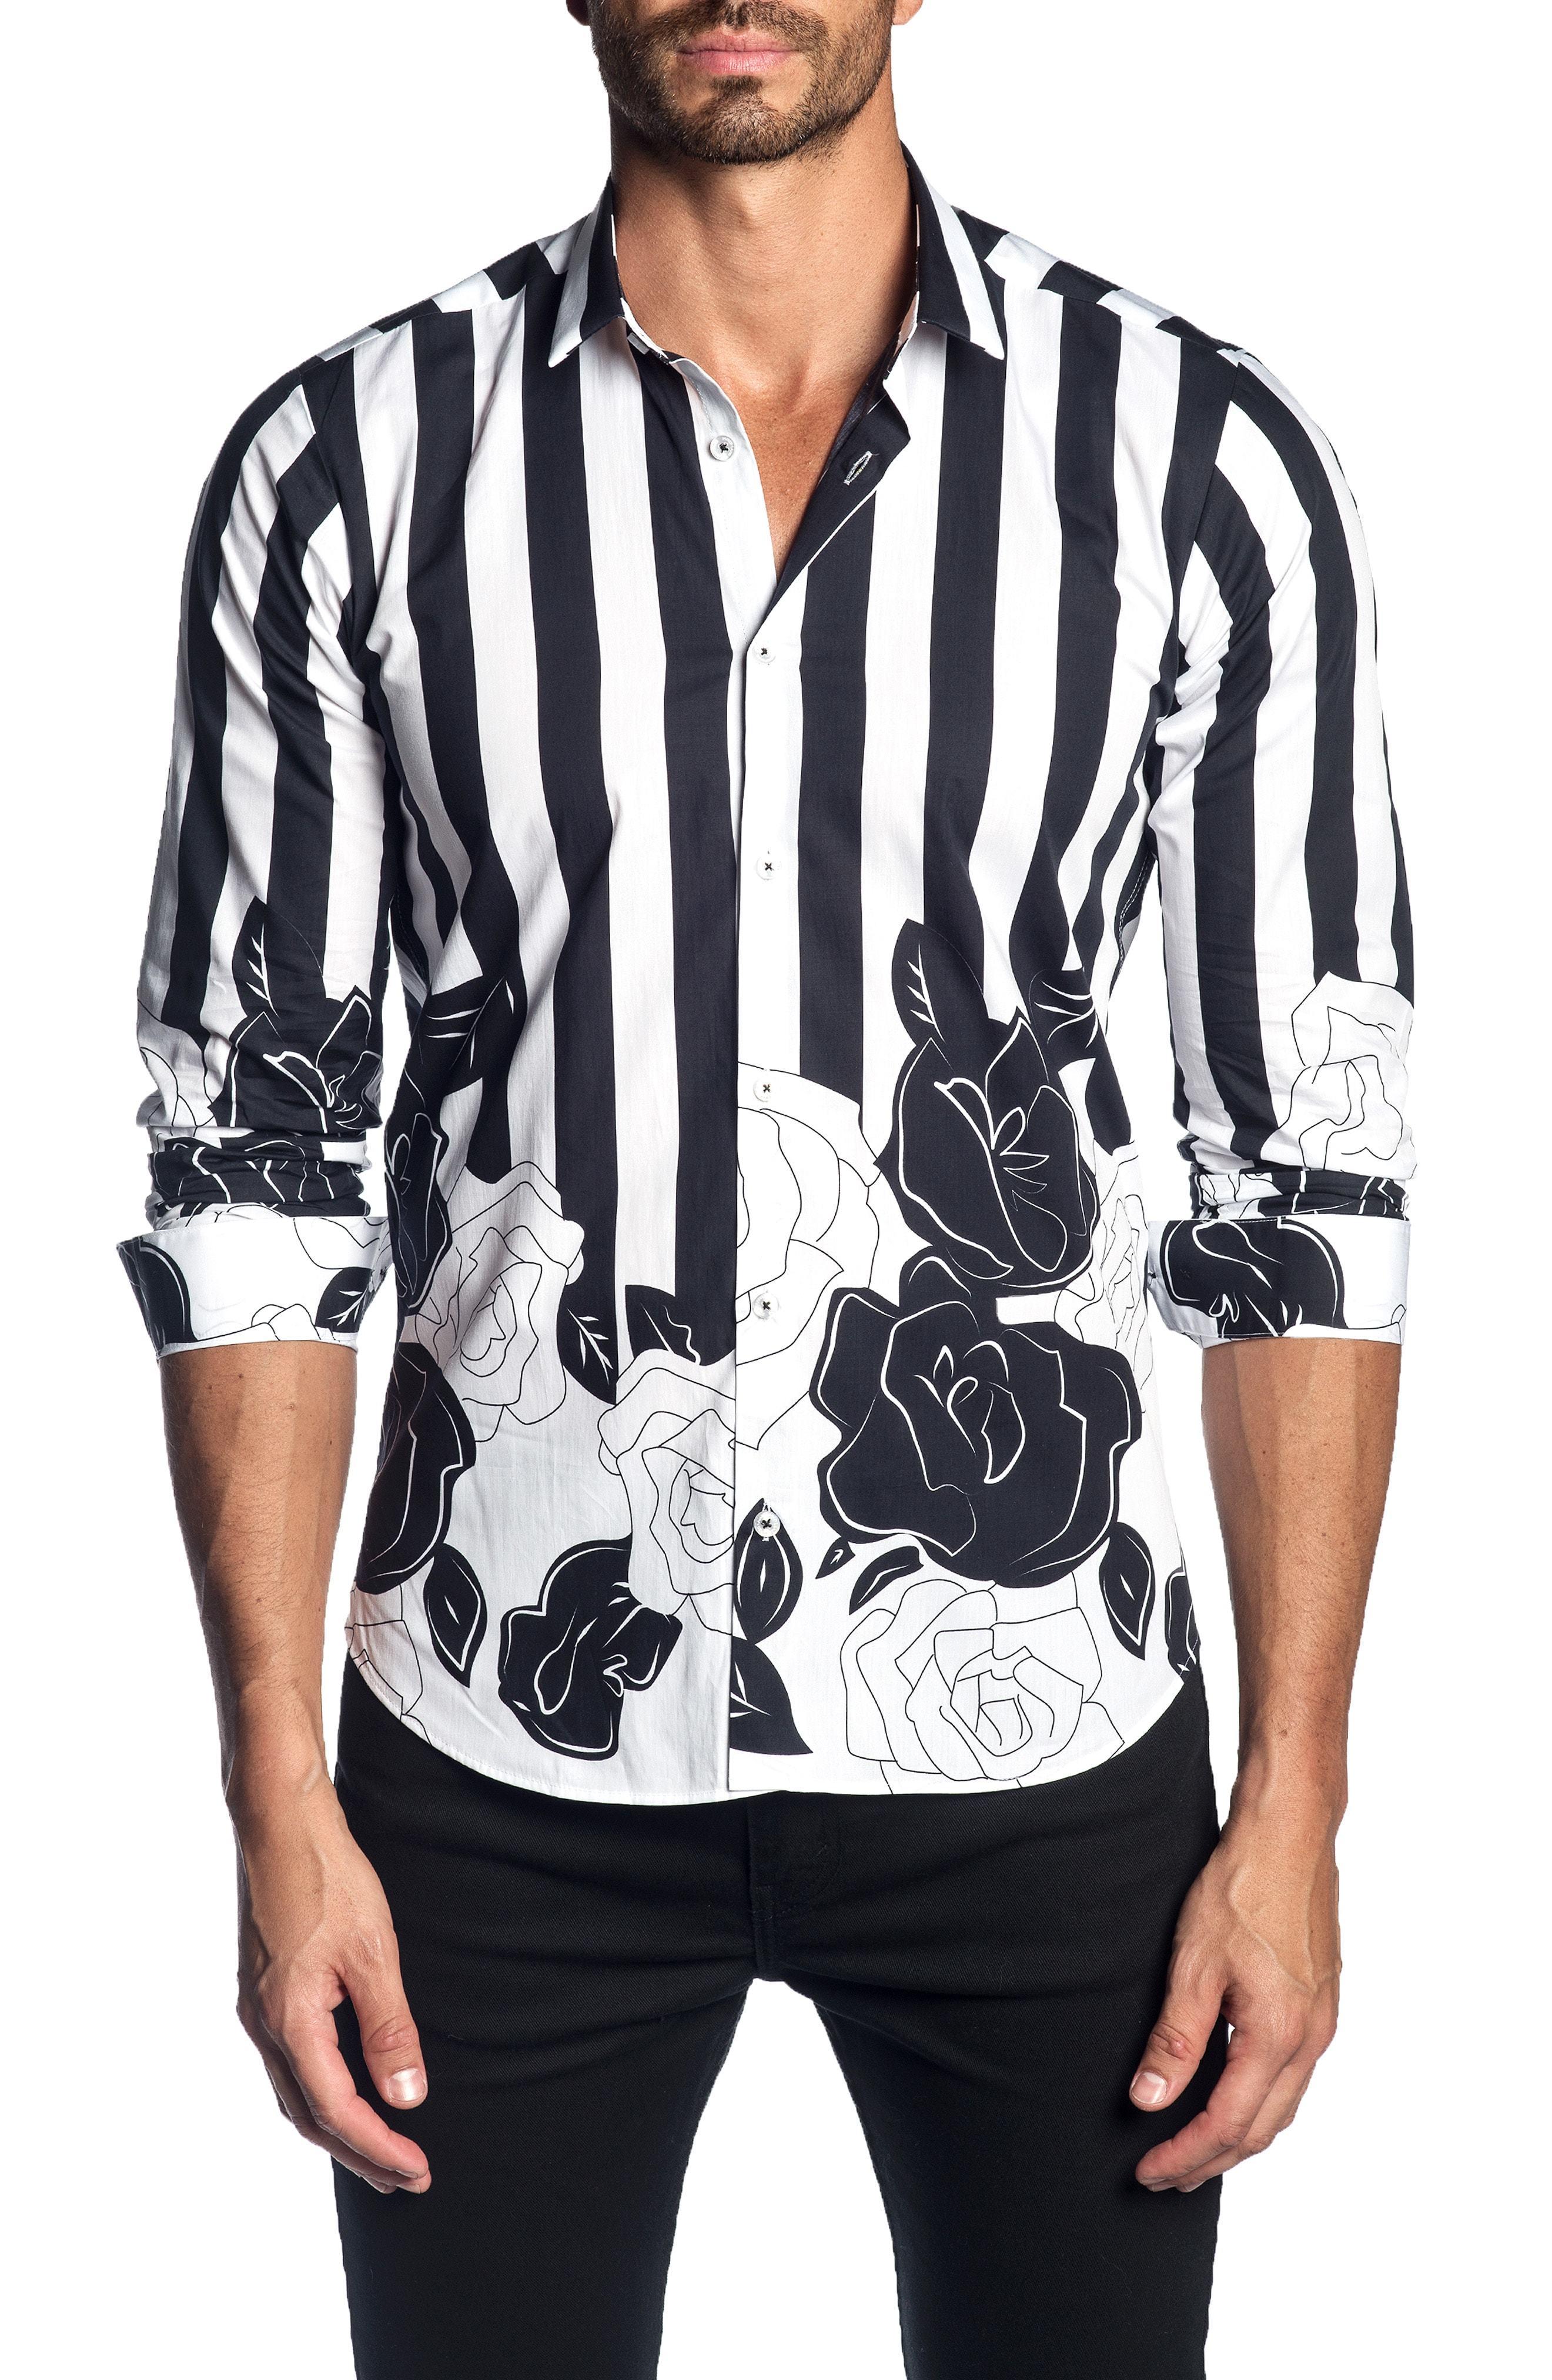 848e3fecdc Jared Lang Trim Fit Stripe Floral Print Sport Shirt, $106 ...